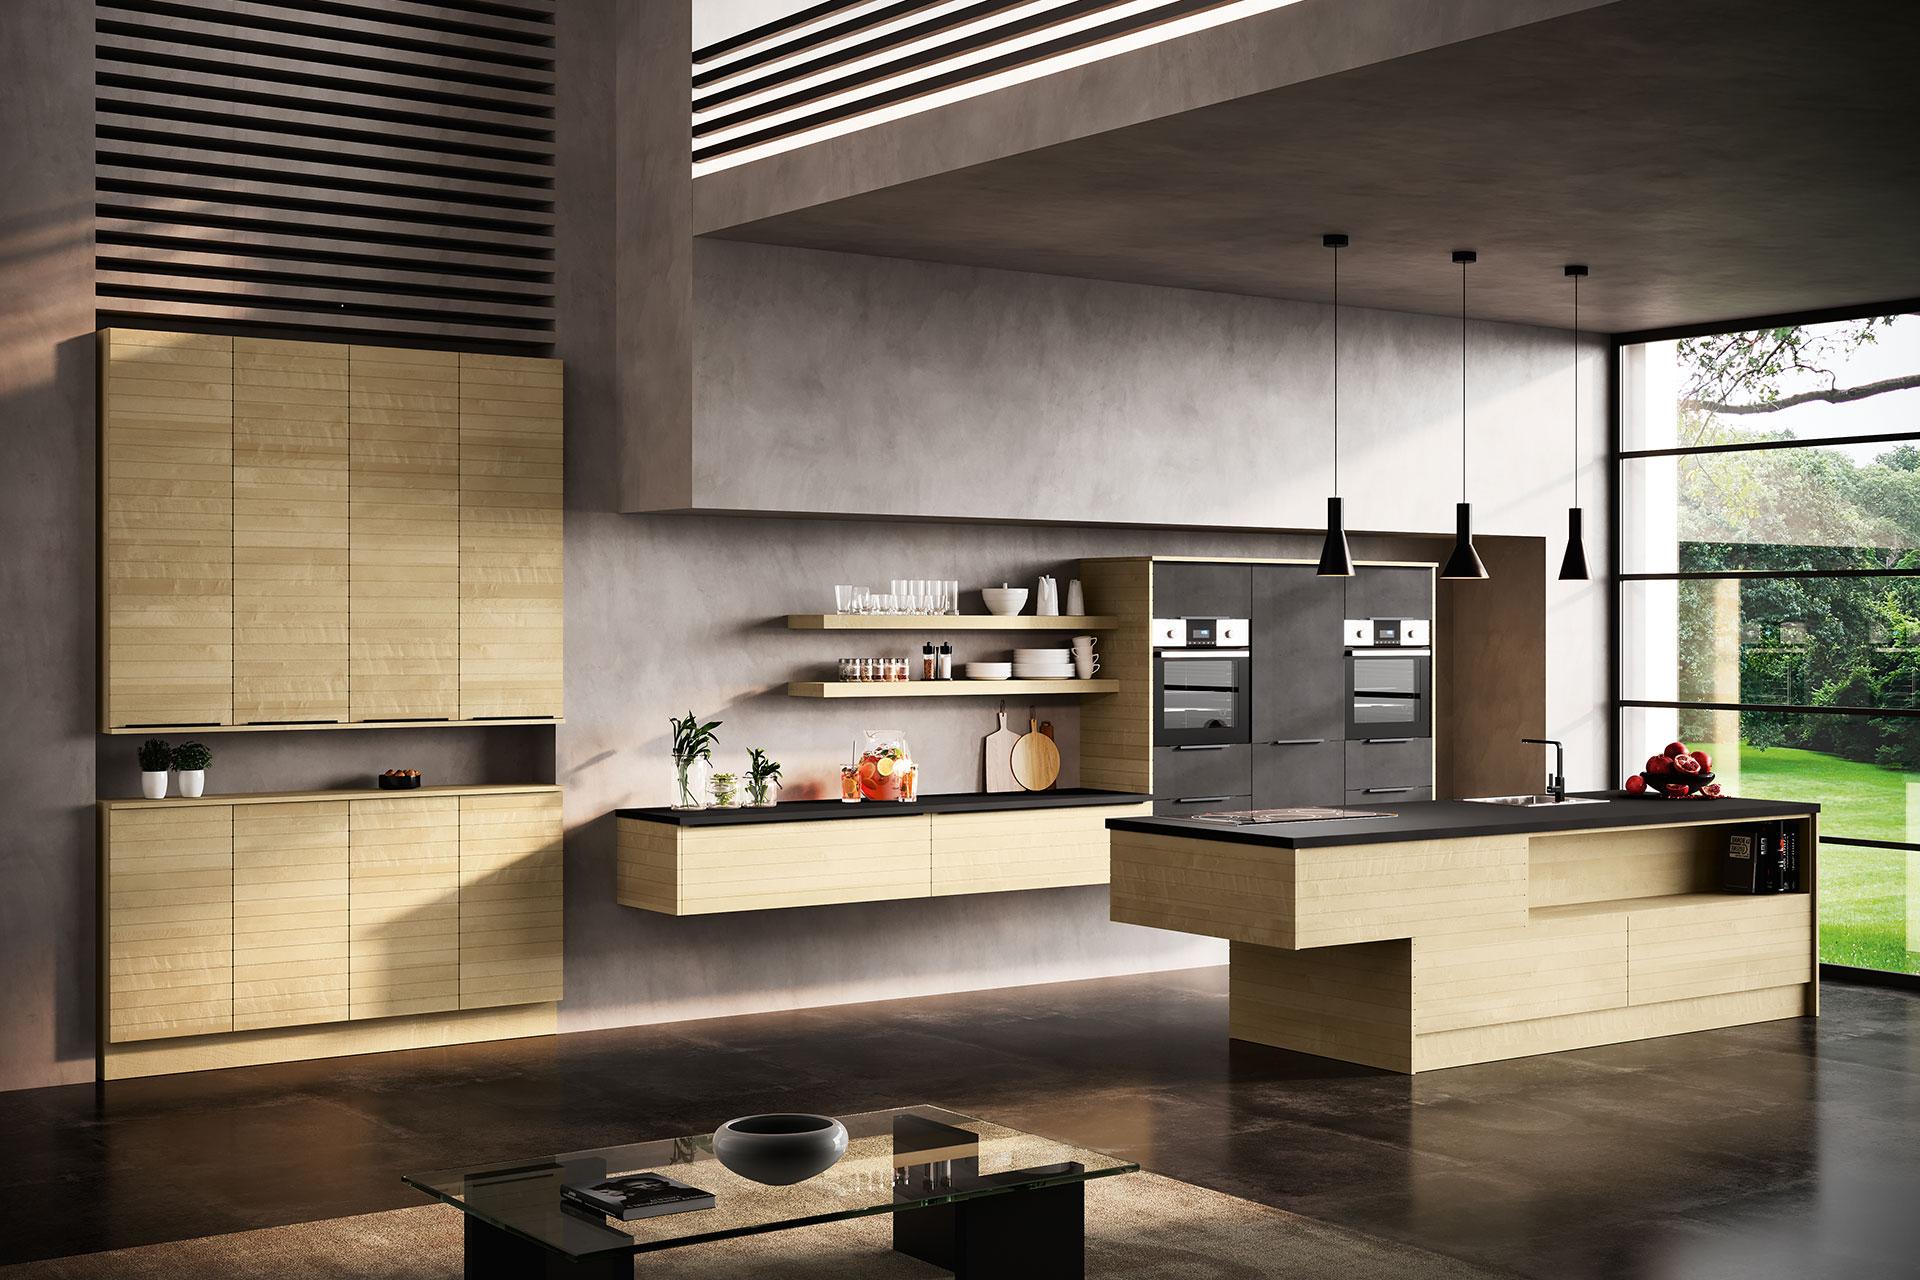 Modell Q-LINE Gesamtansicht, Oster Küche